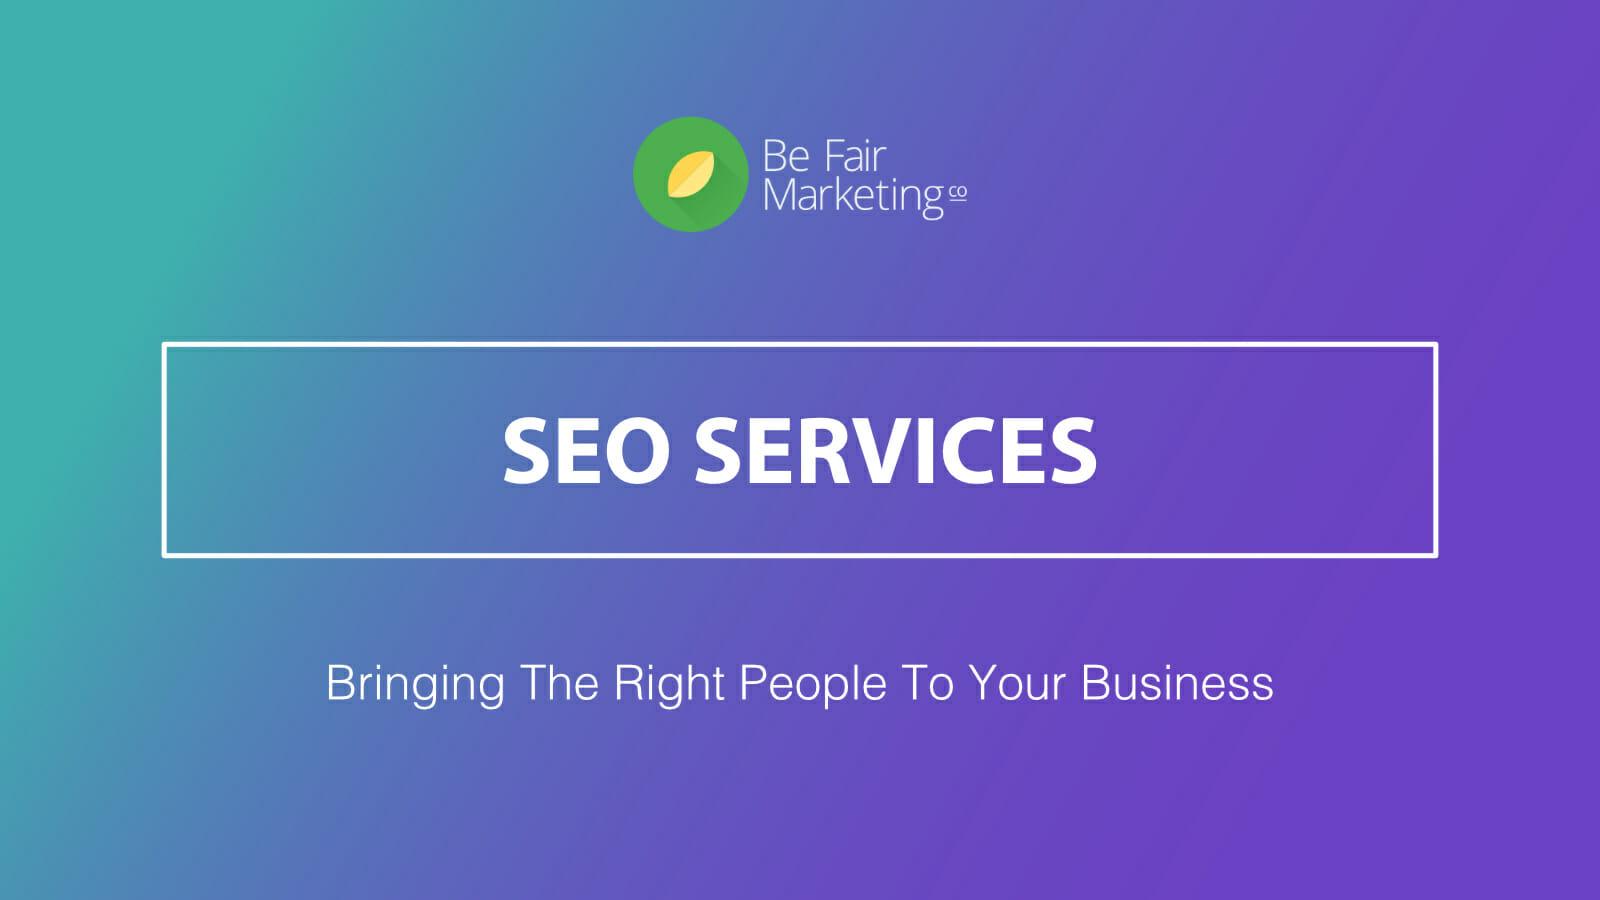 Bí quyết SEO website lên top đầu Google